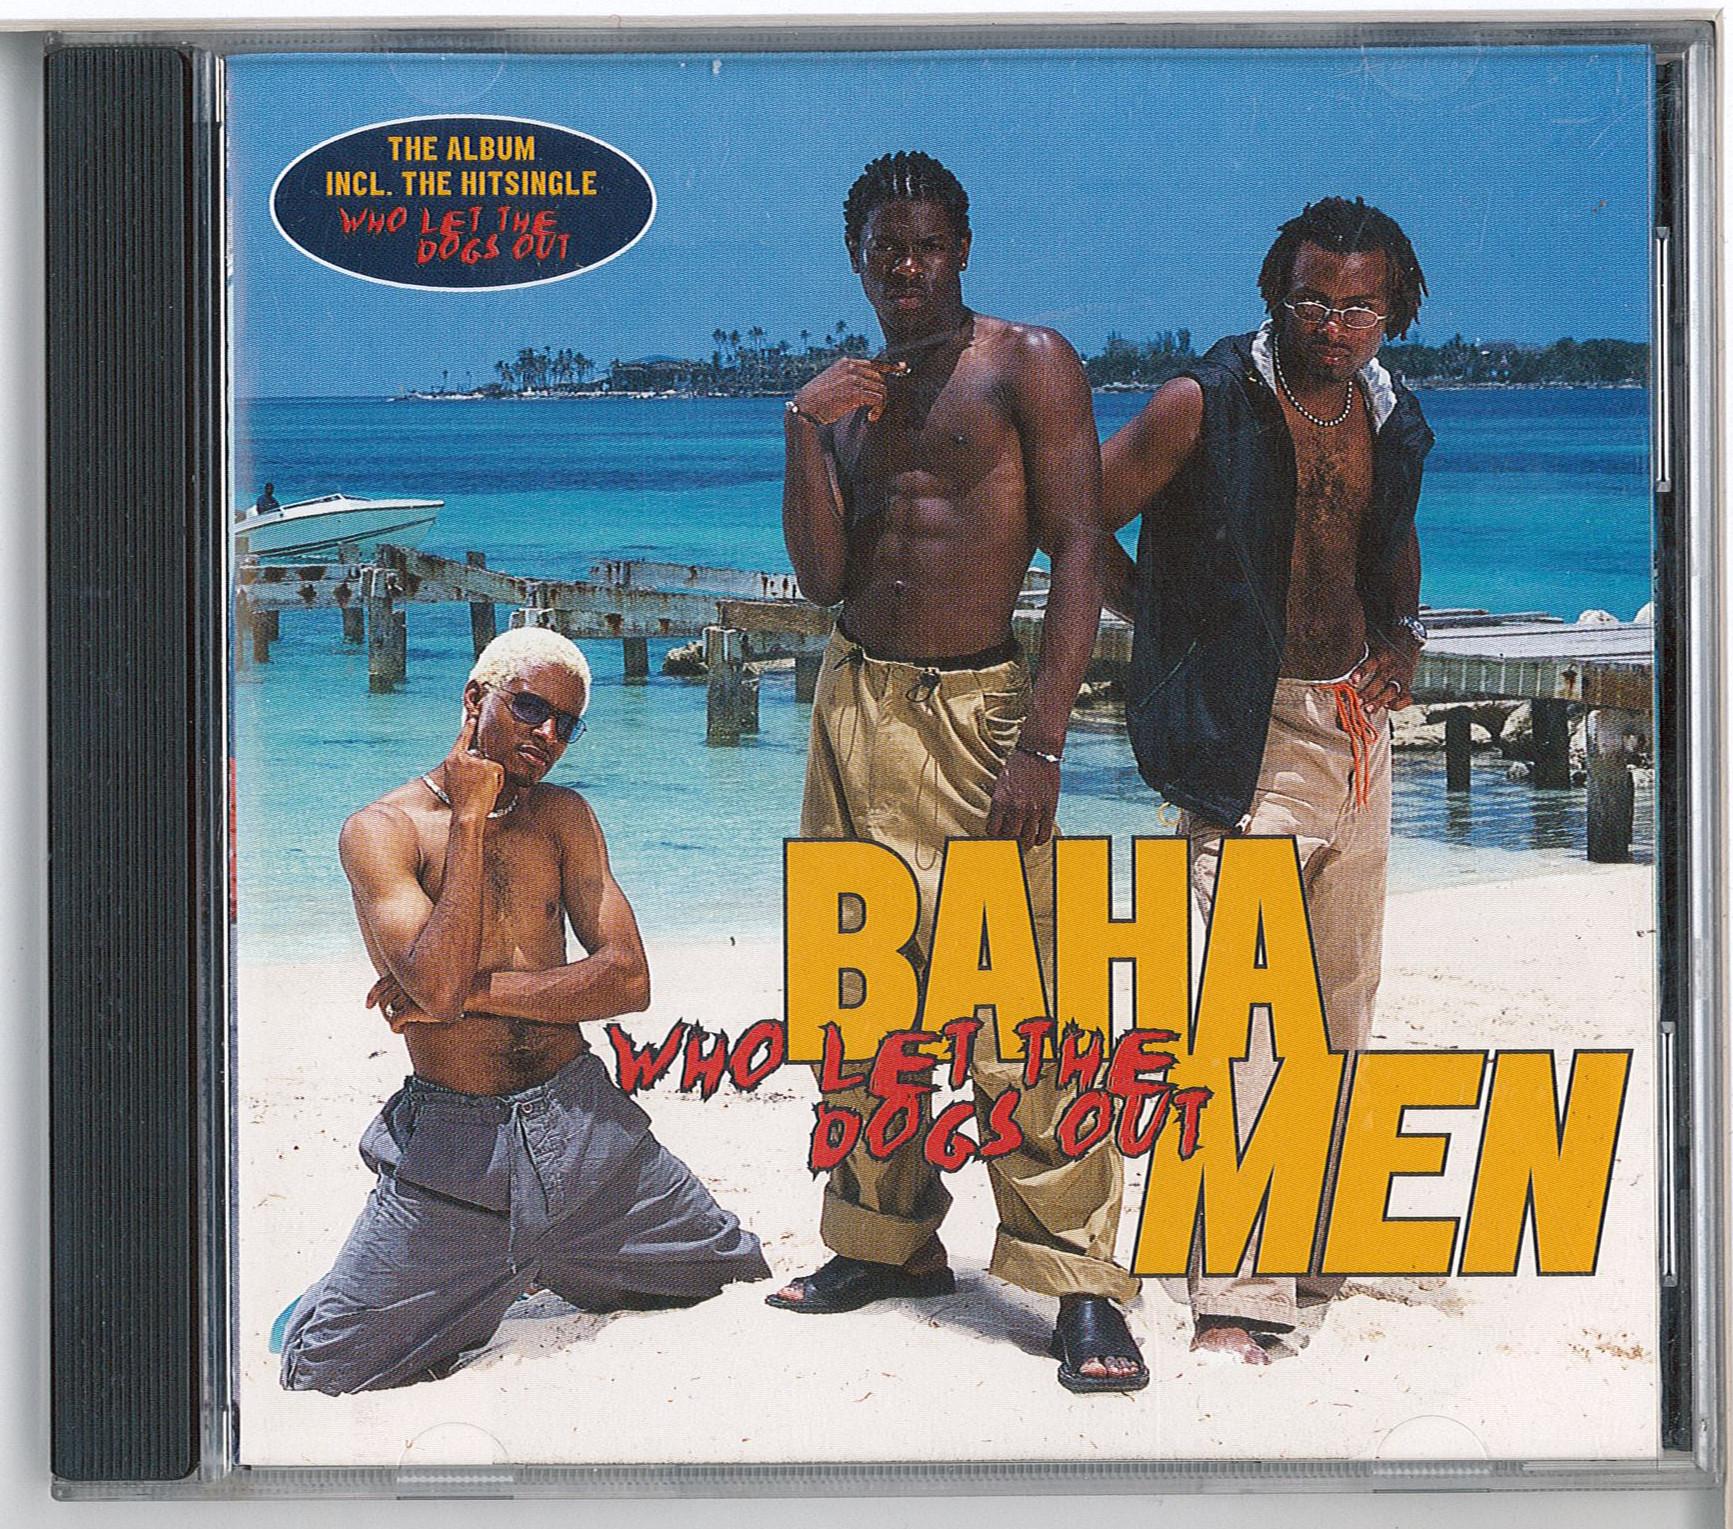 WLWLTDOO-2000-CD-BAHA-MAN-WLTDO-AU-NZ-FRONT.jpg